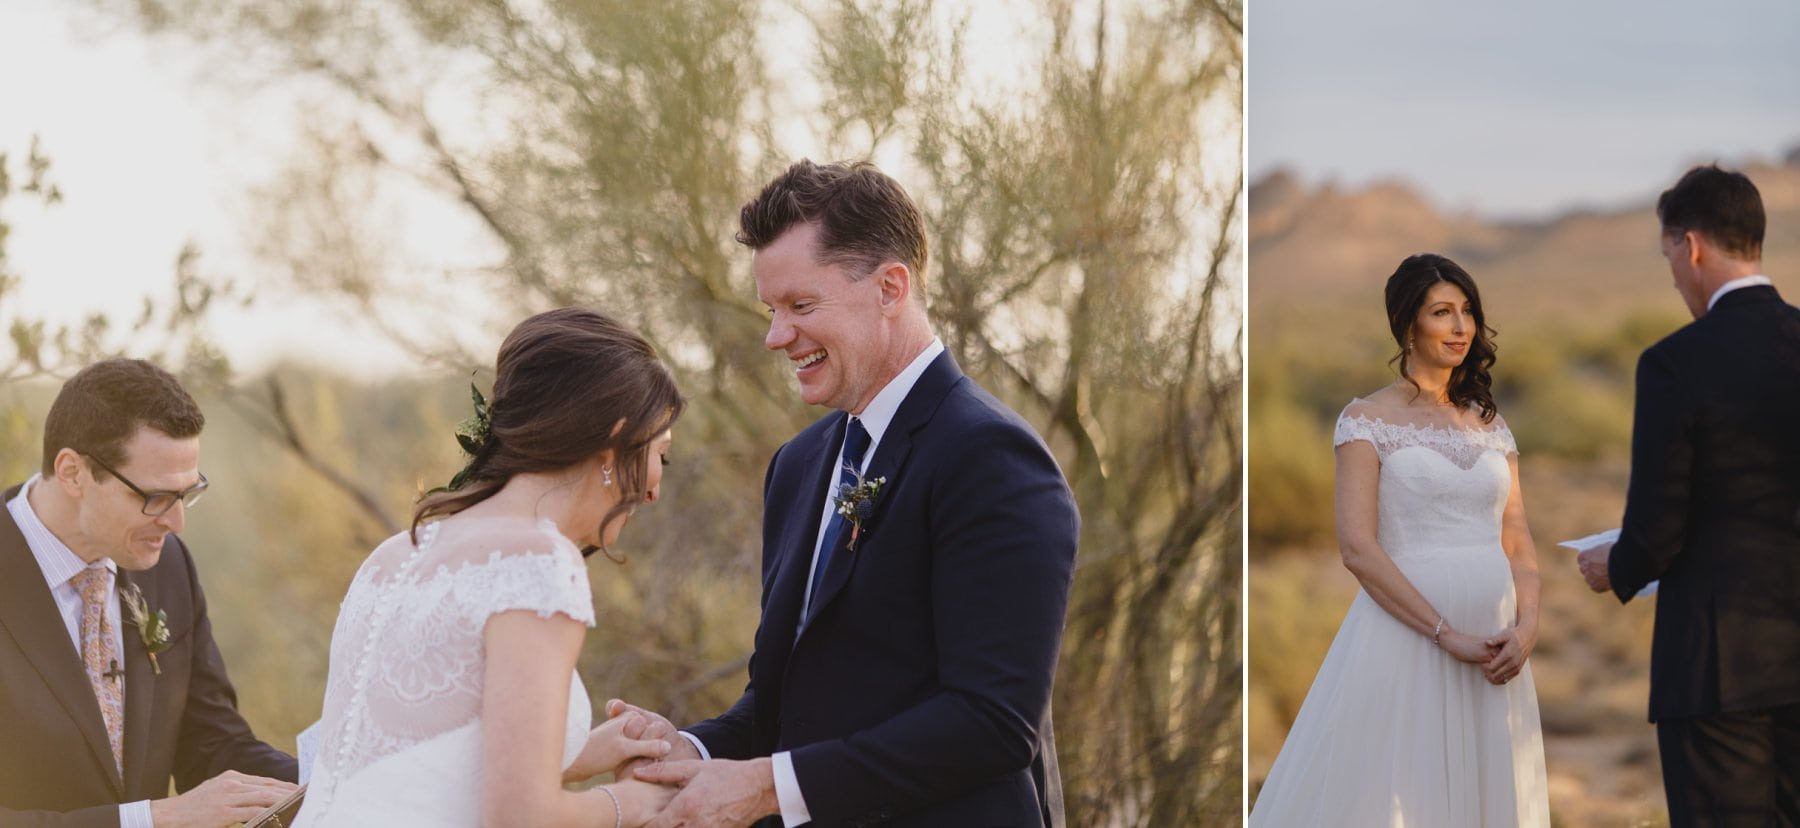 candid documentary elopement photos Arizona elopement photographer